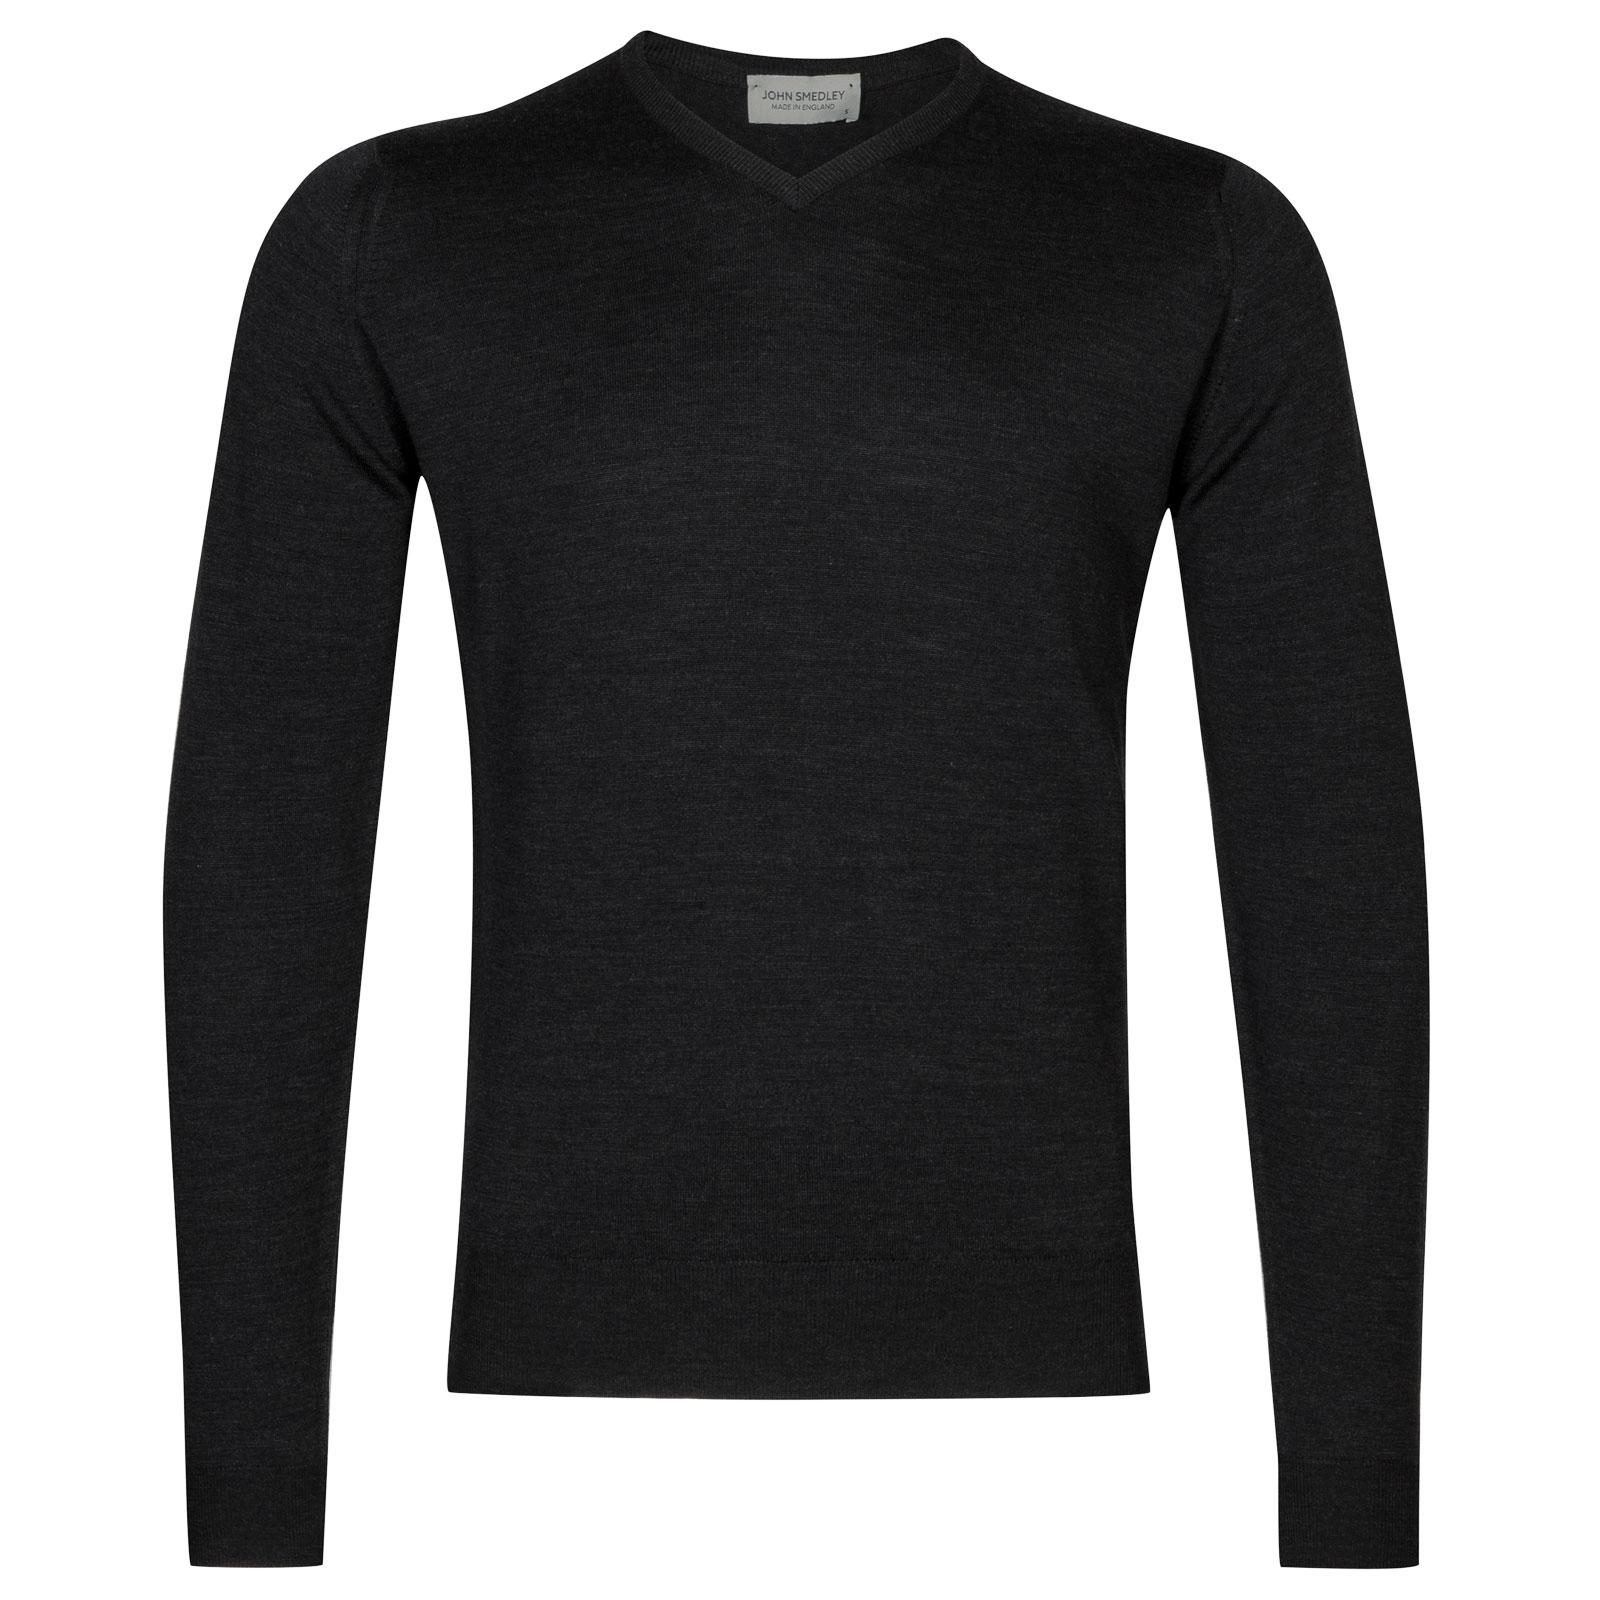 John Smedley Genoa Merino Wool Pullover in Hepburn Smoke-XL